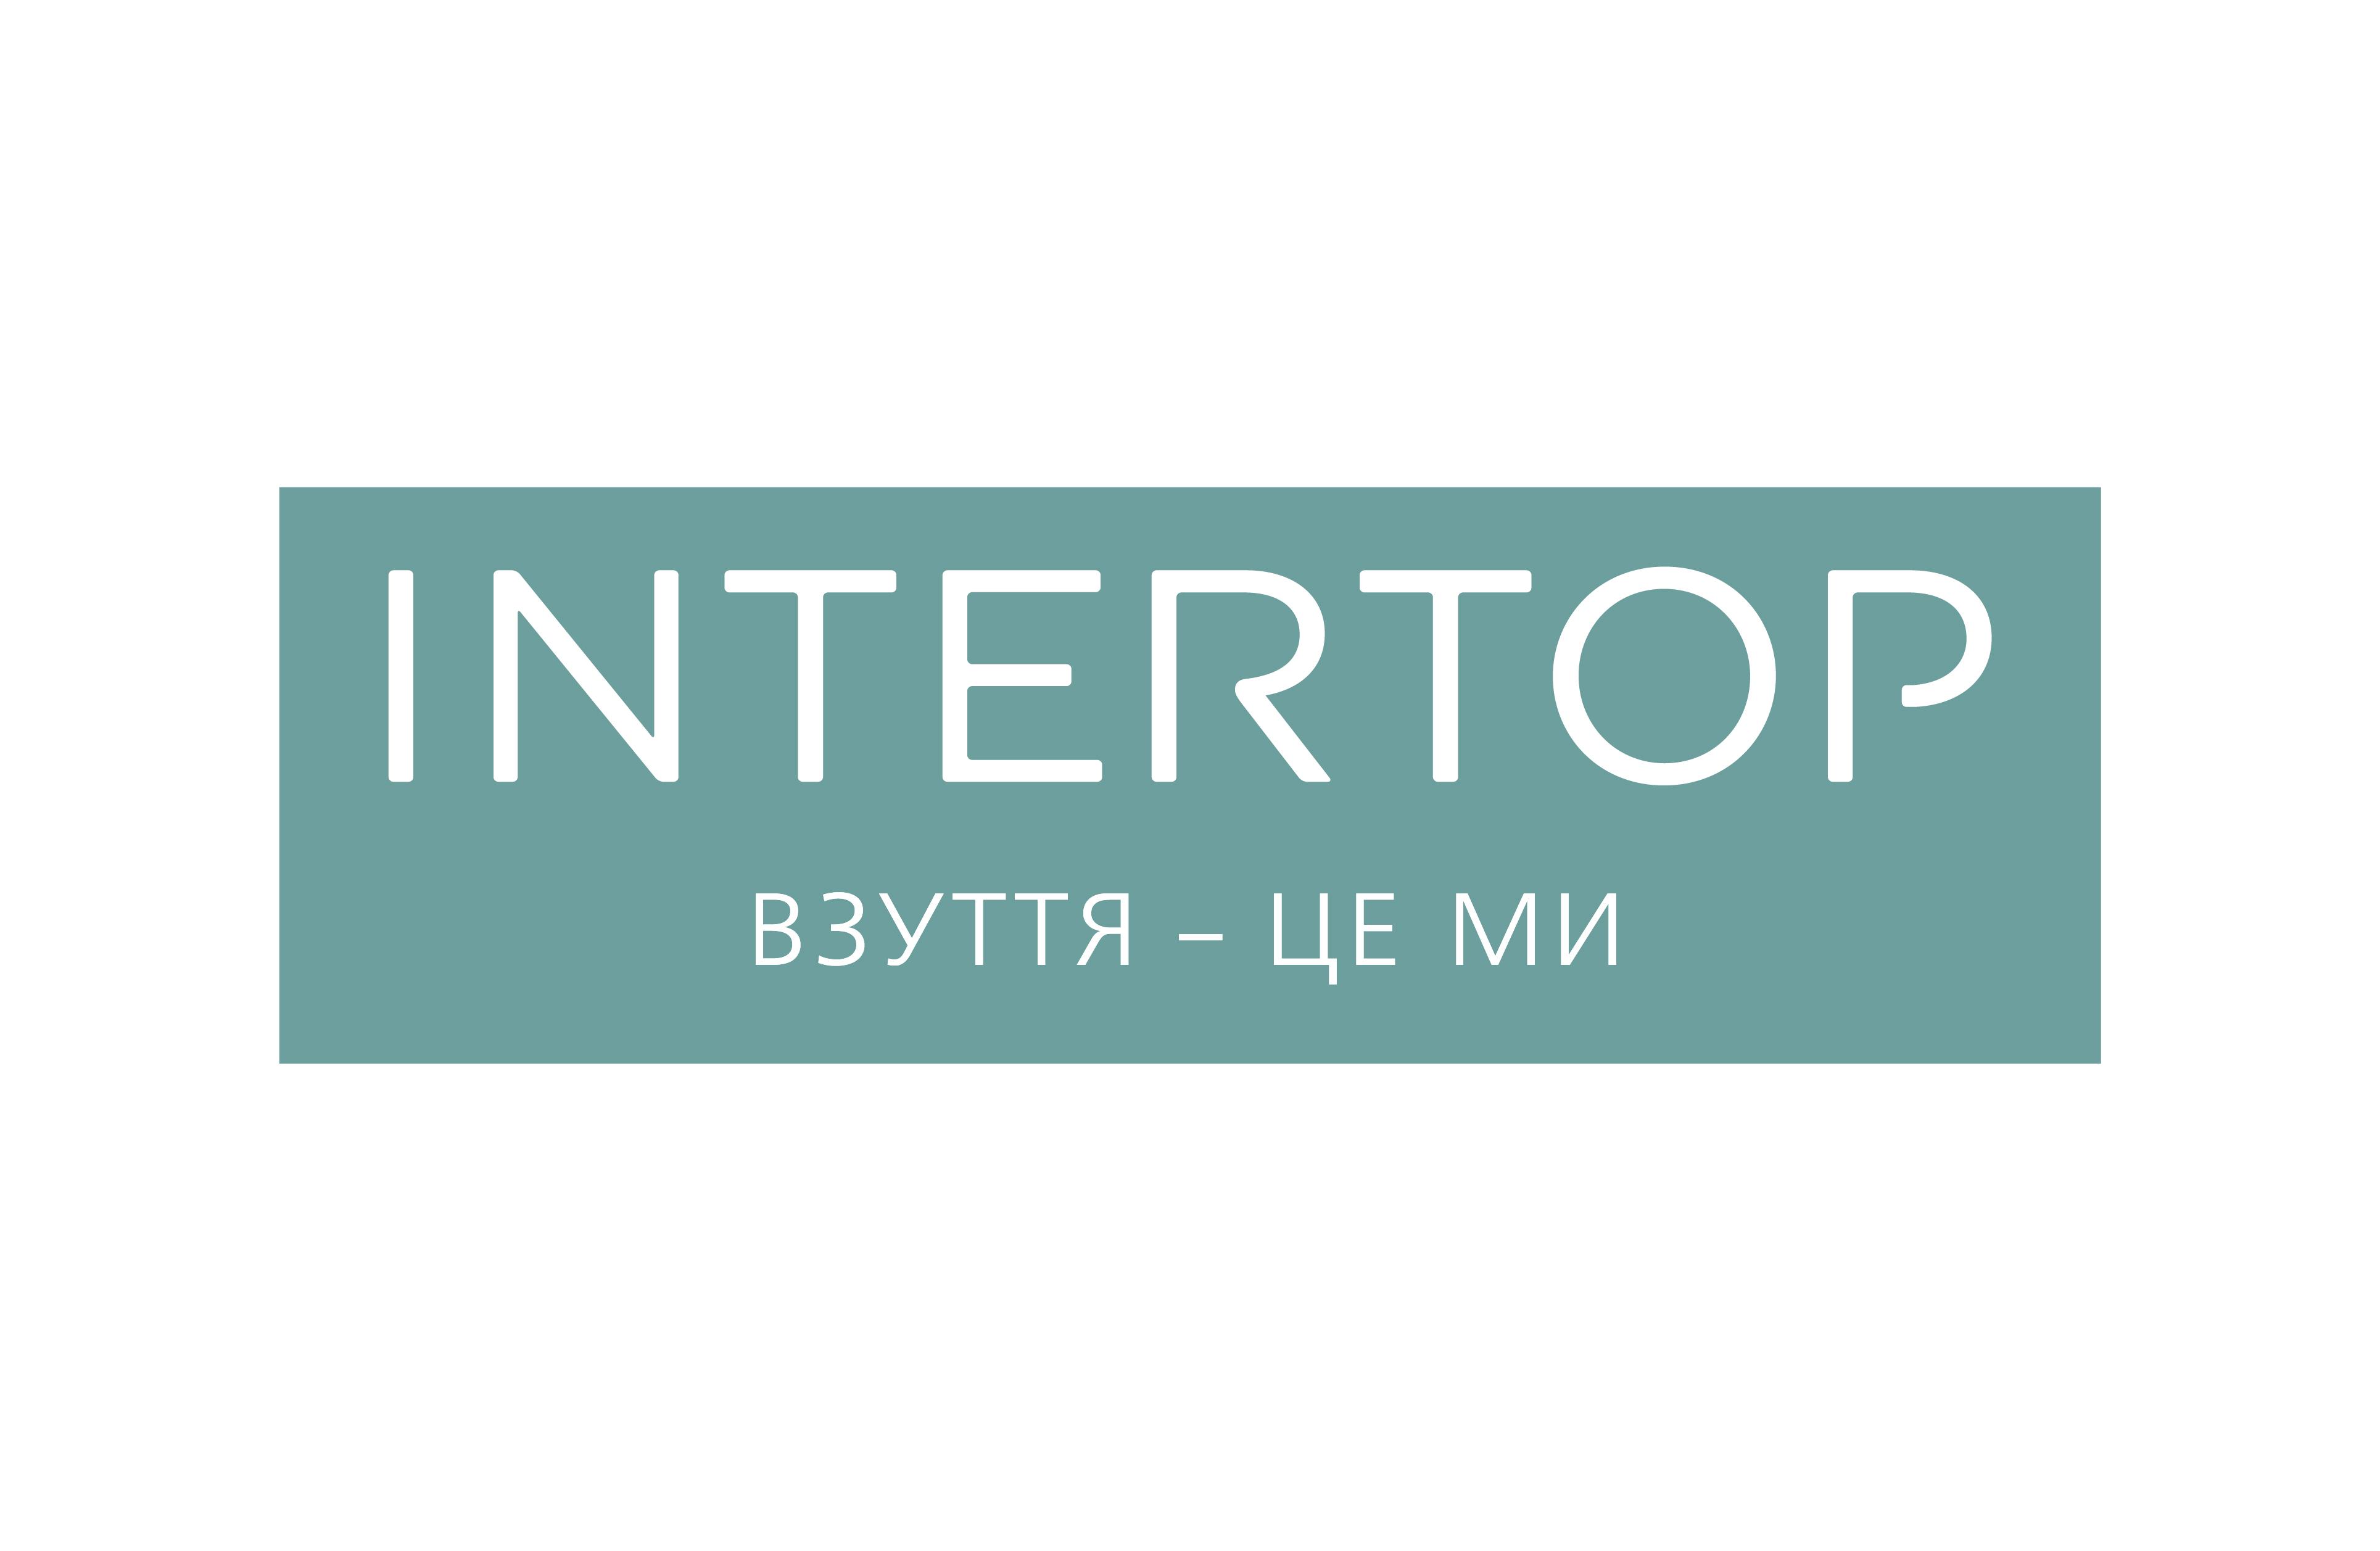 Intertop-Logotype